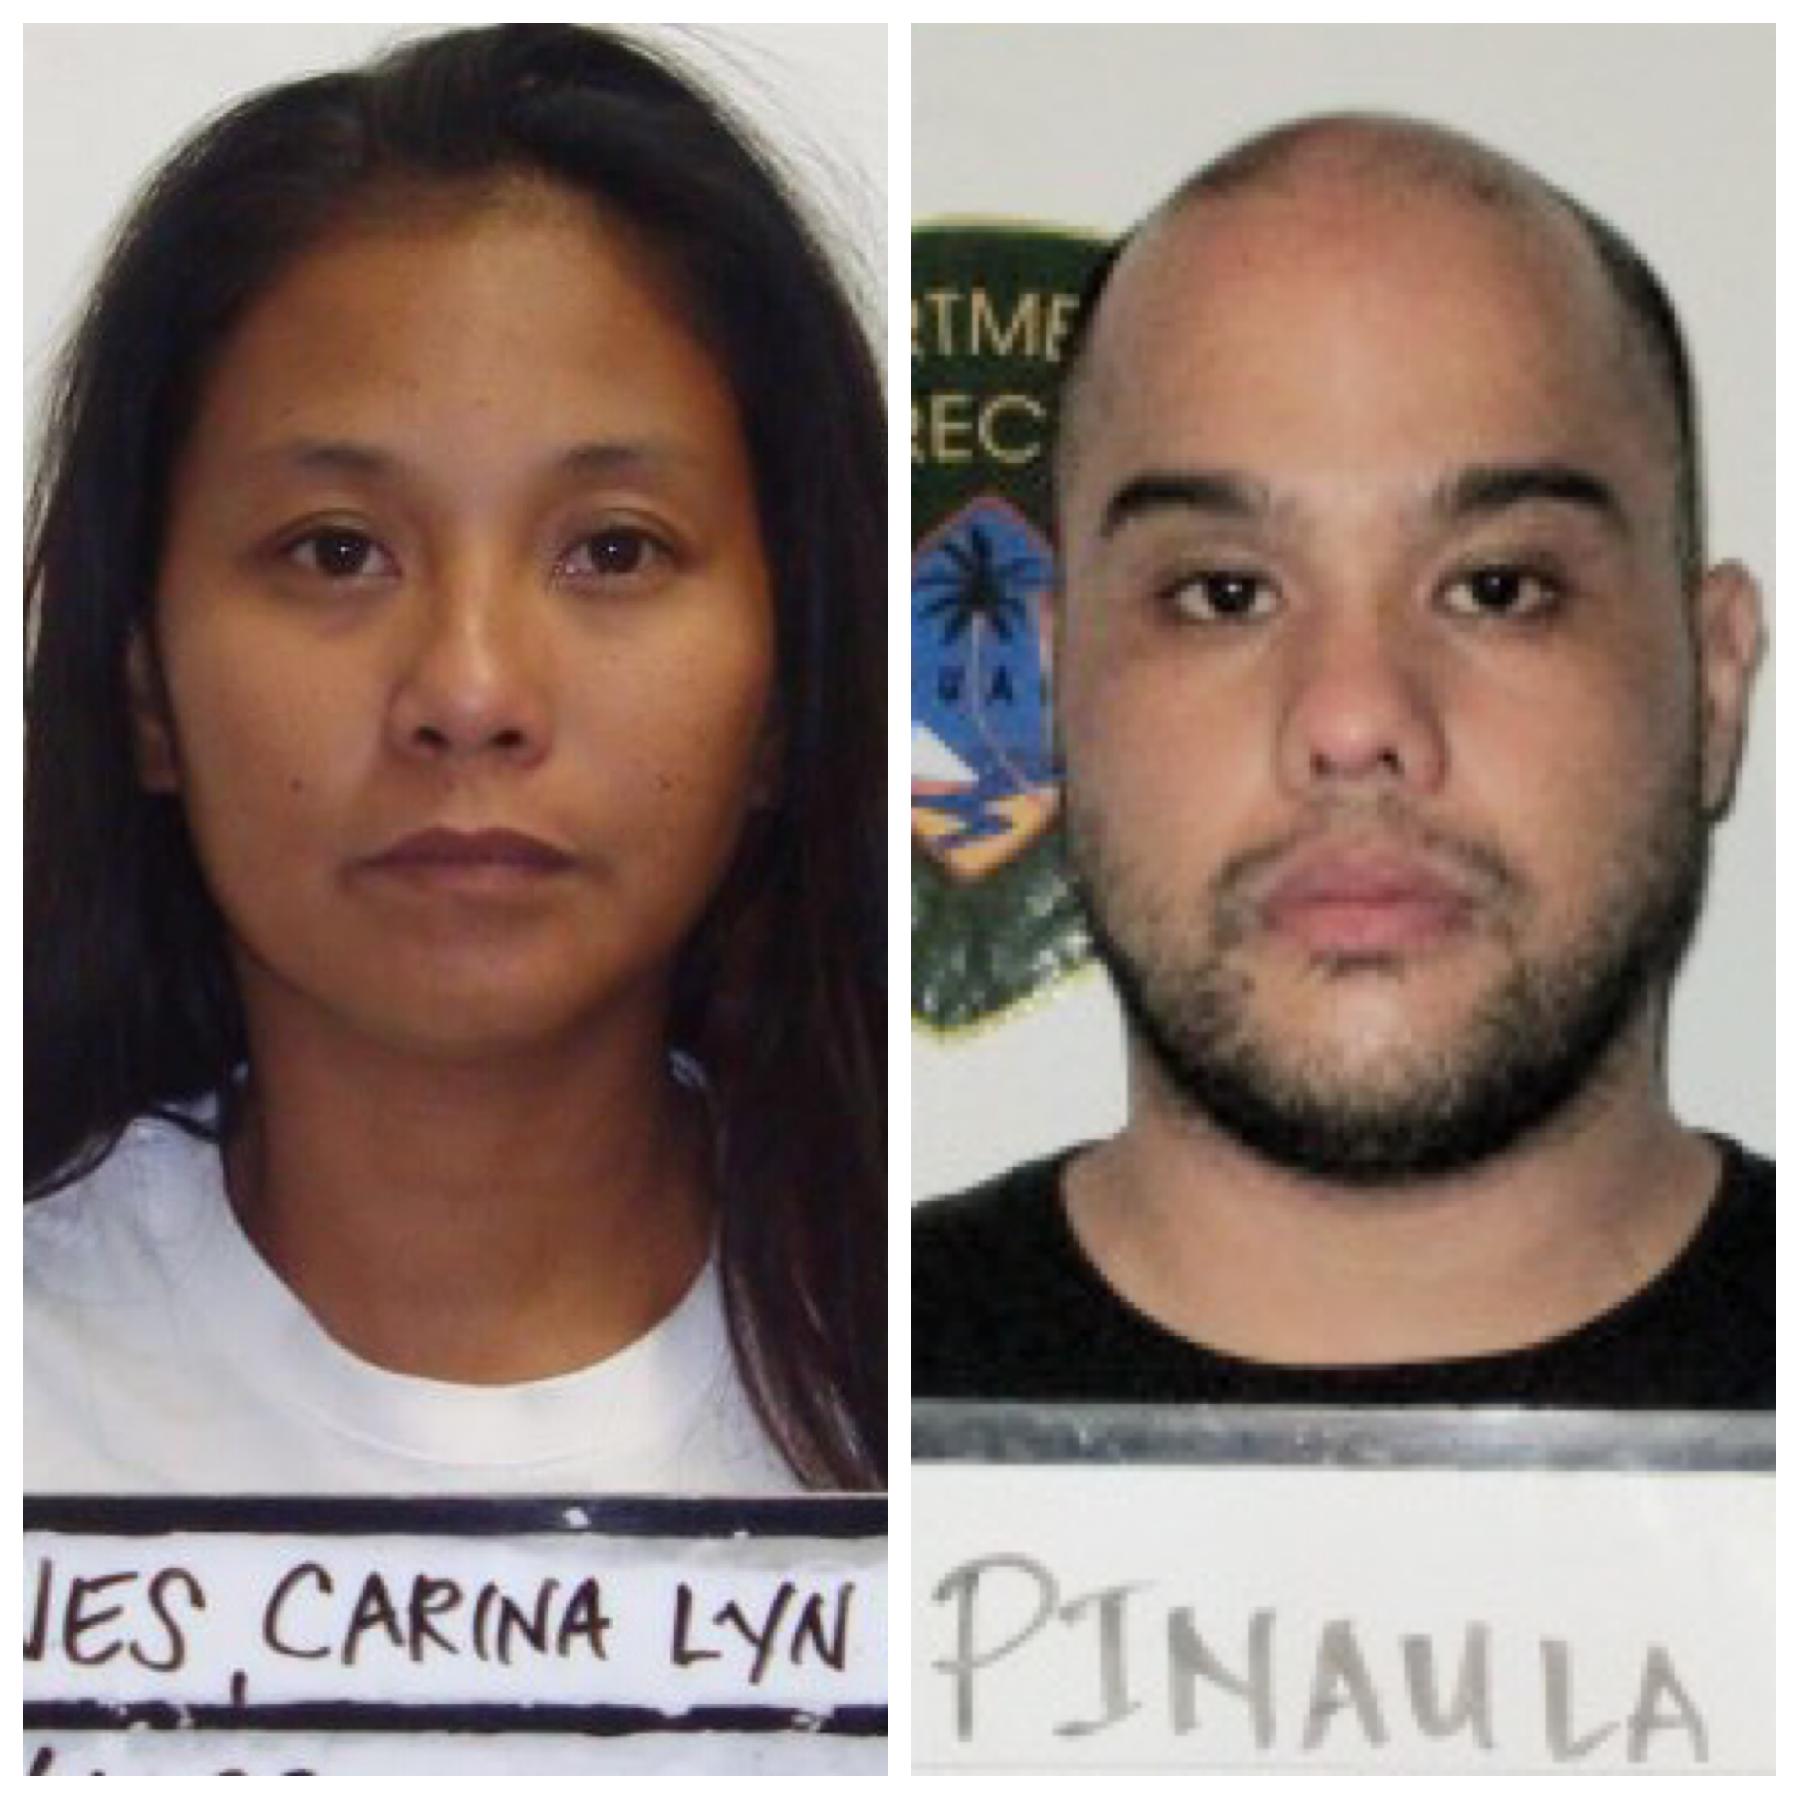 William Pinaula and Carina Lyn Cruz Barnes charged in credit card theft